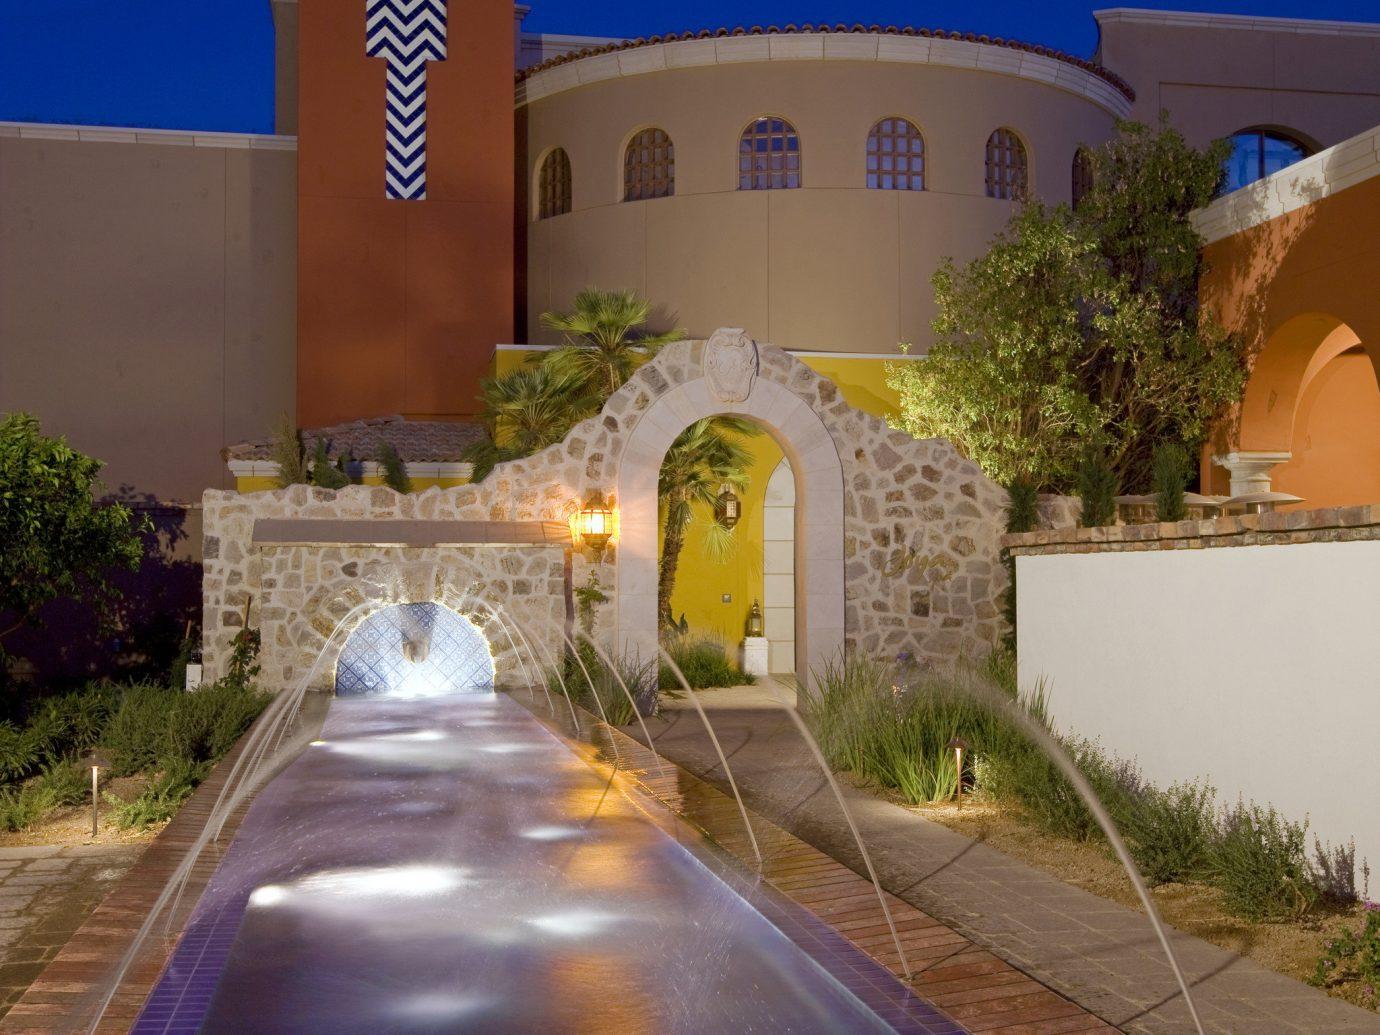 Health + Wellness Hotels Spa Retreats outdoor road vacation travel